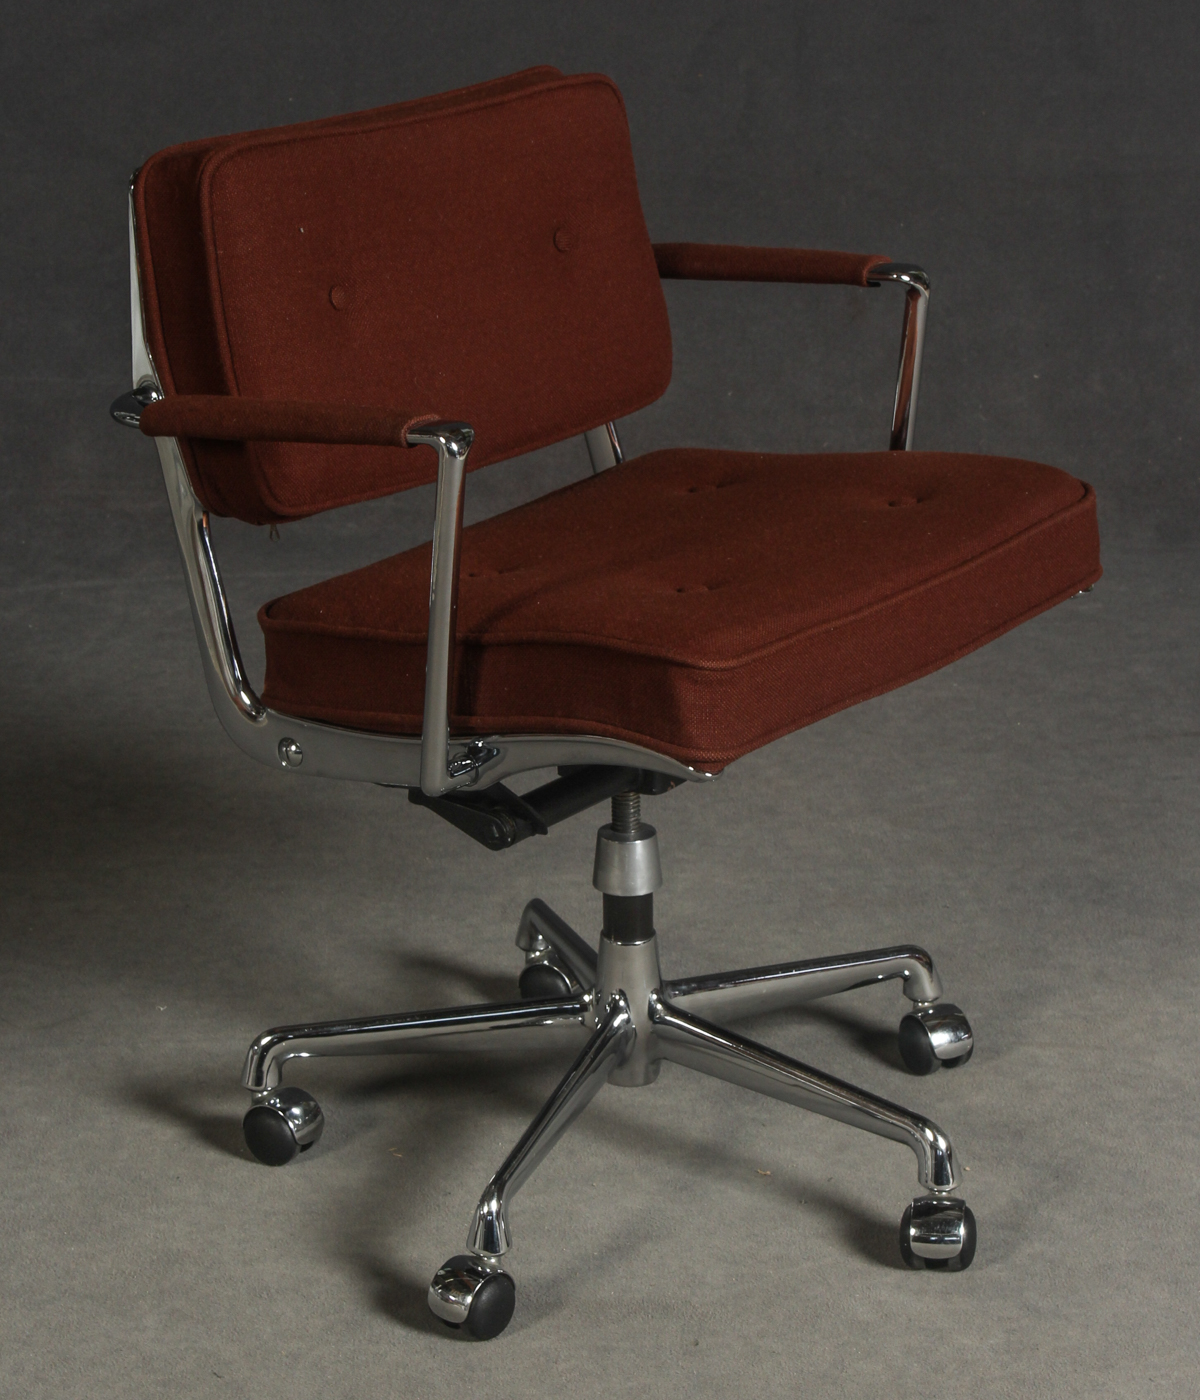 Charles Eames Burostuhl Modell Es 102 Von Herman Miller Lauritz Com